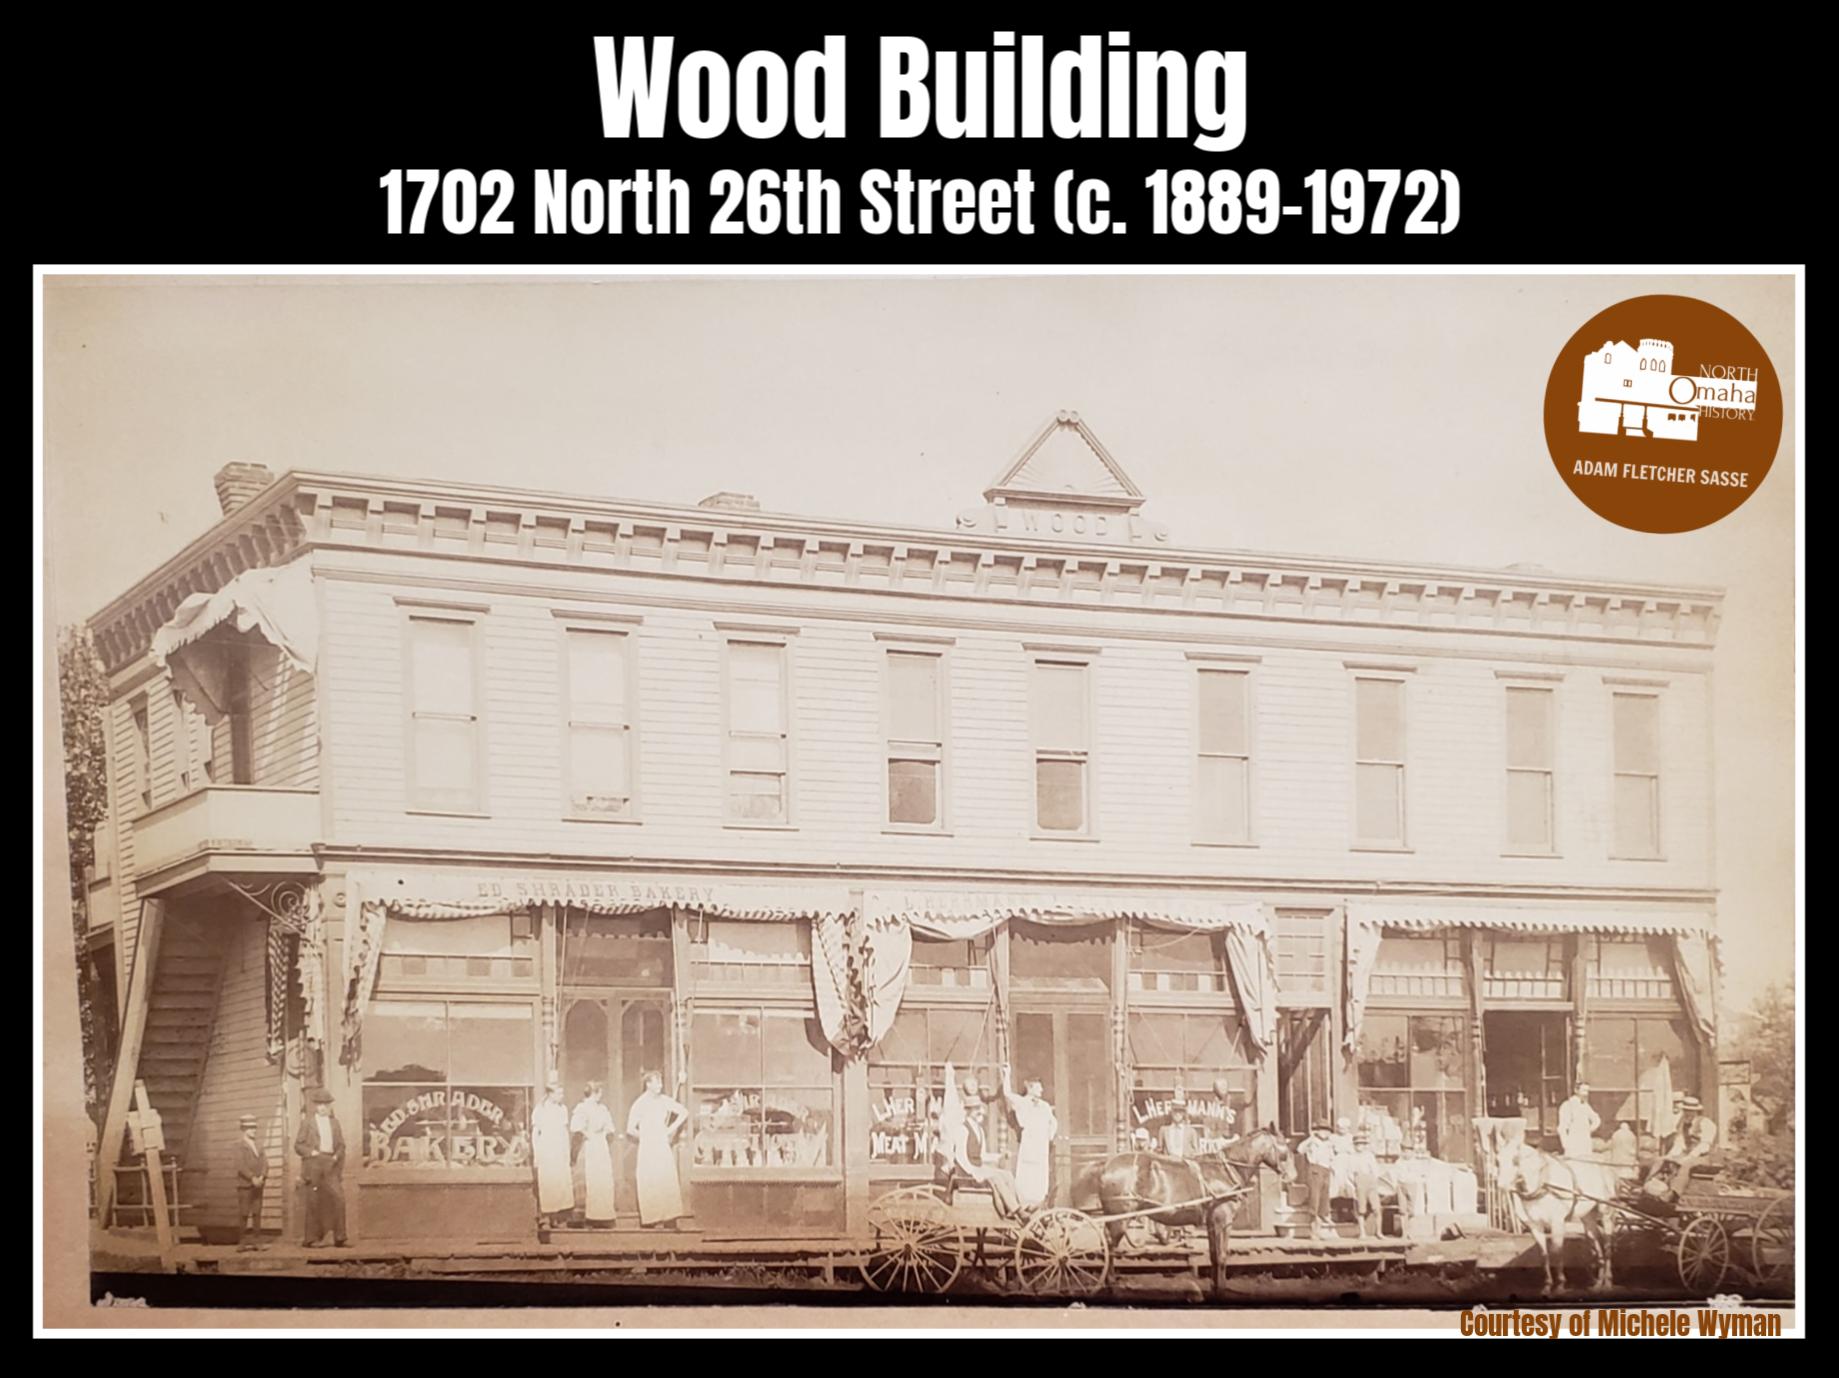 Wood Building, 1702 North 26th Street, North Omaha, Nebraska